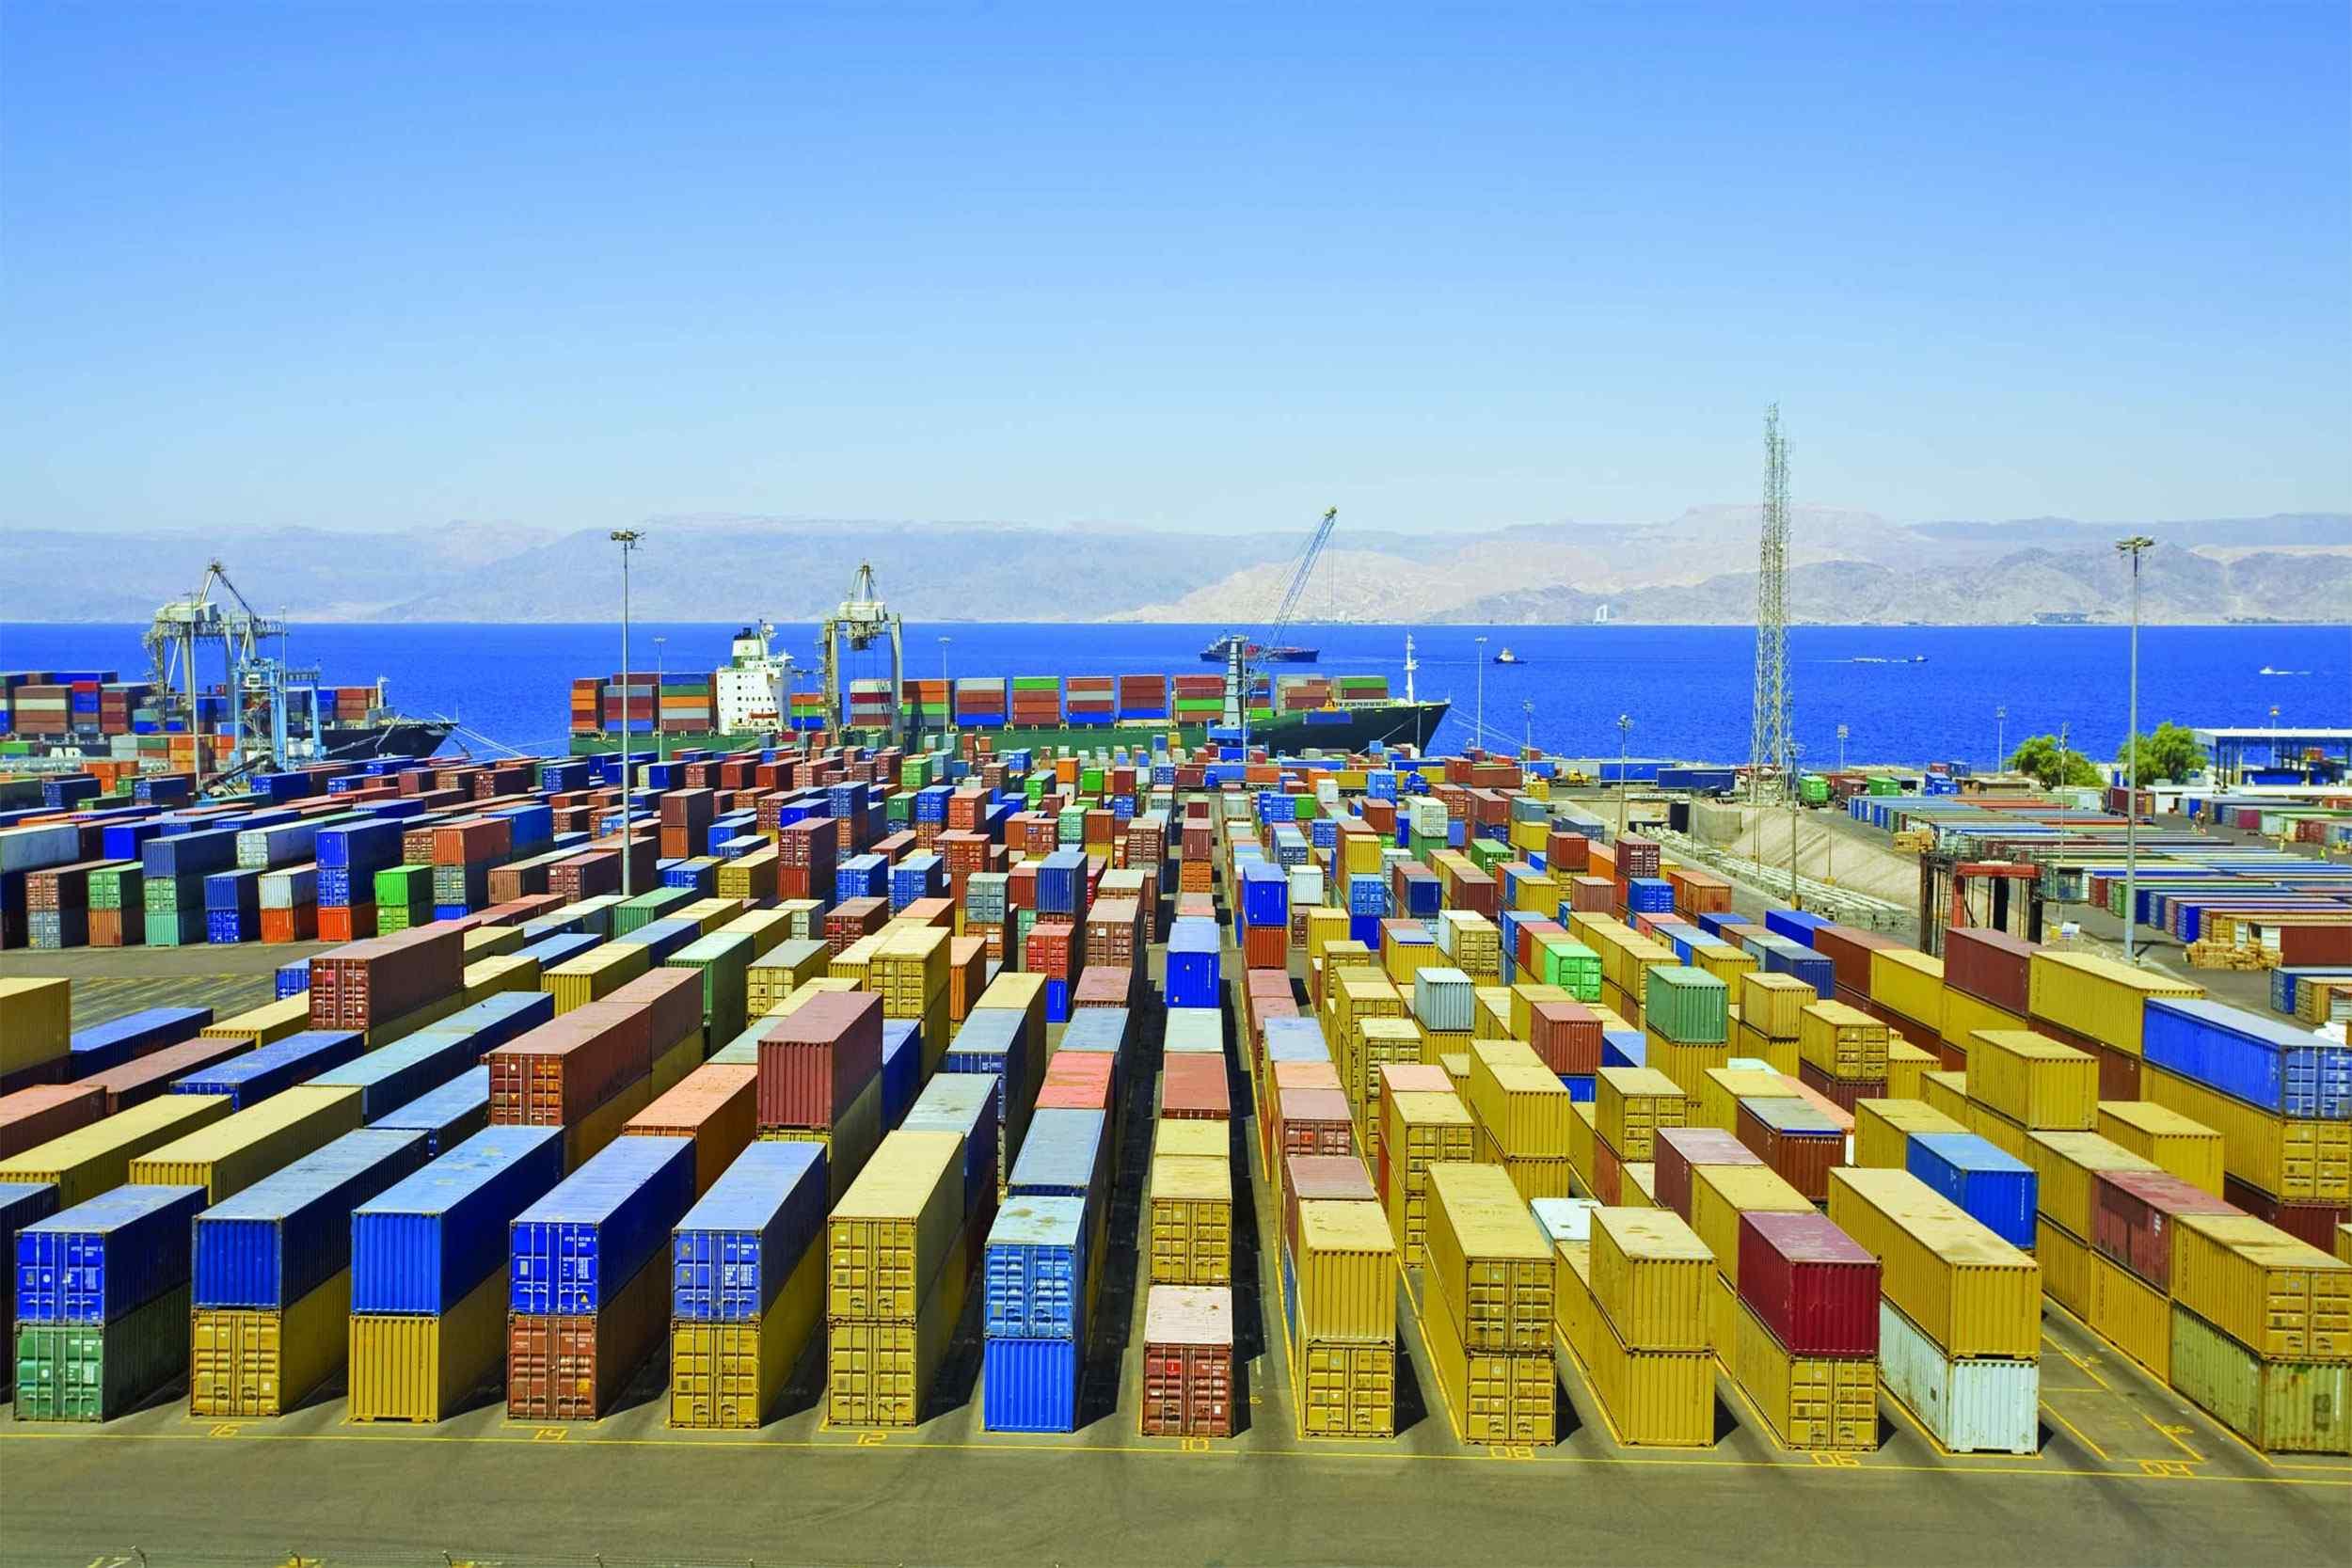 https://cobe-transport-logistics.com/wp-content/uploads/2015/09/Harbor-warehouse.jpg